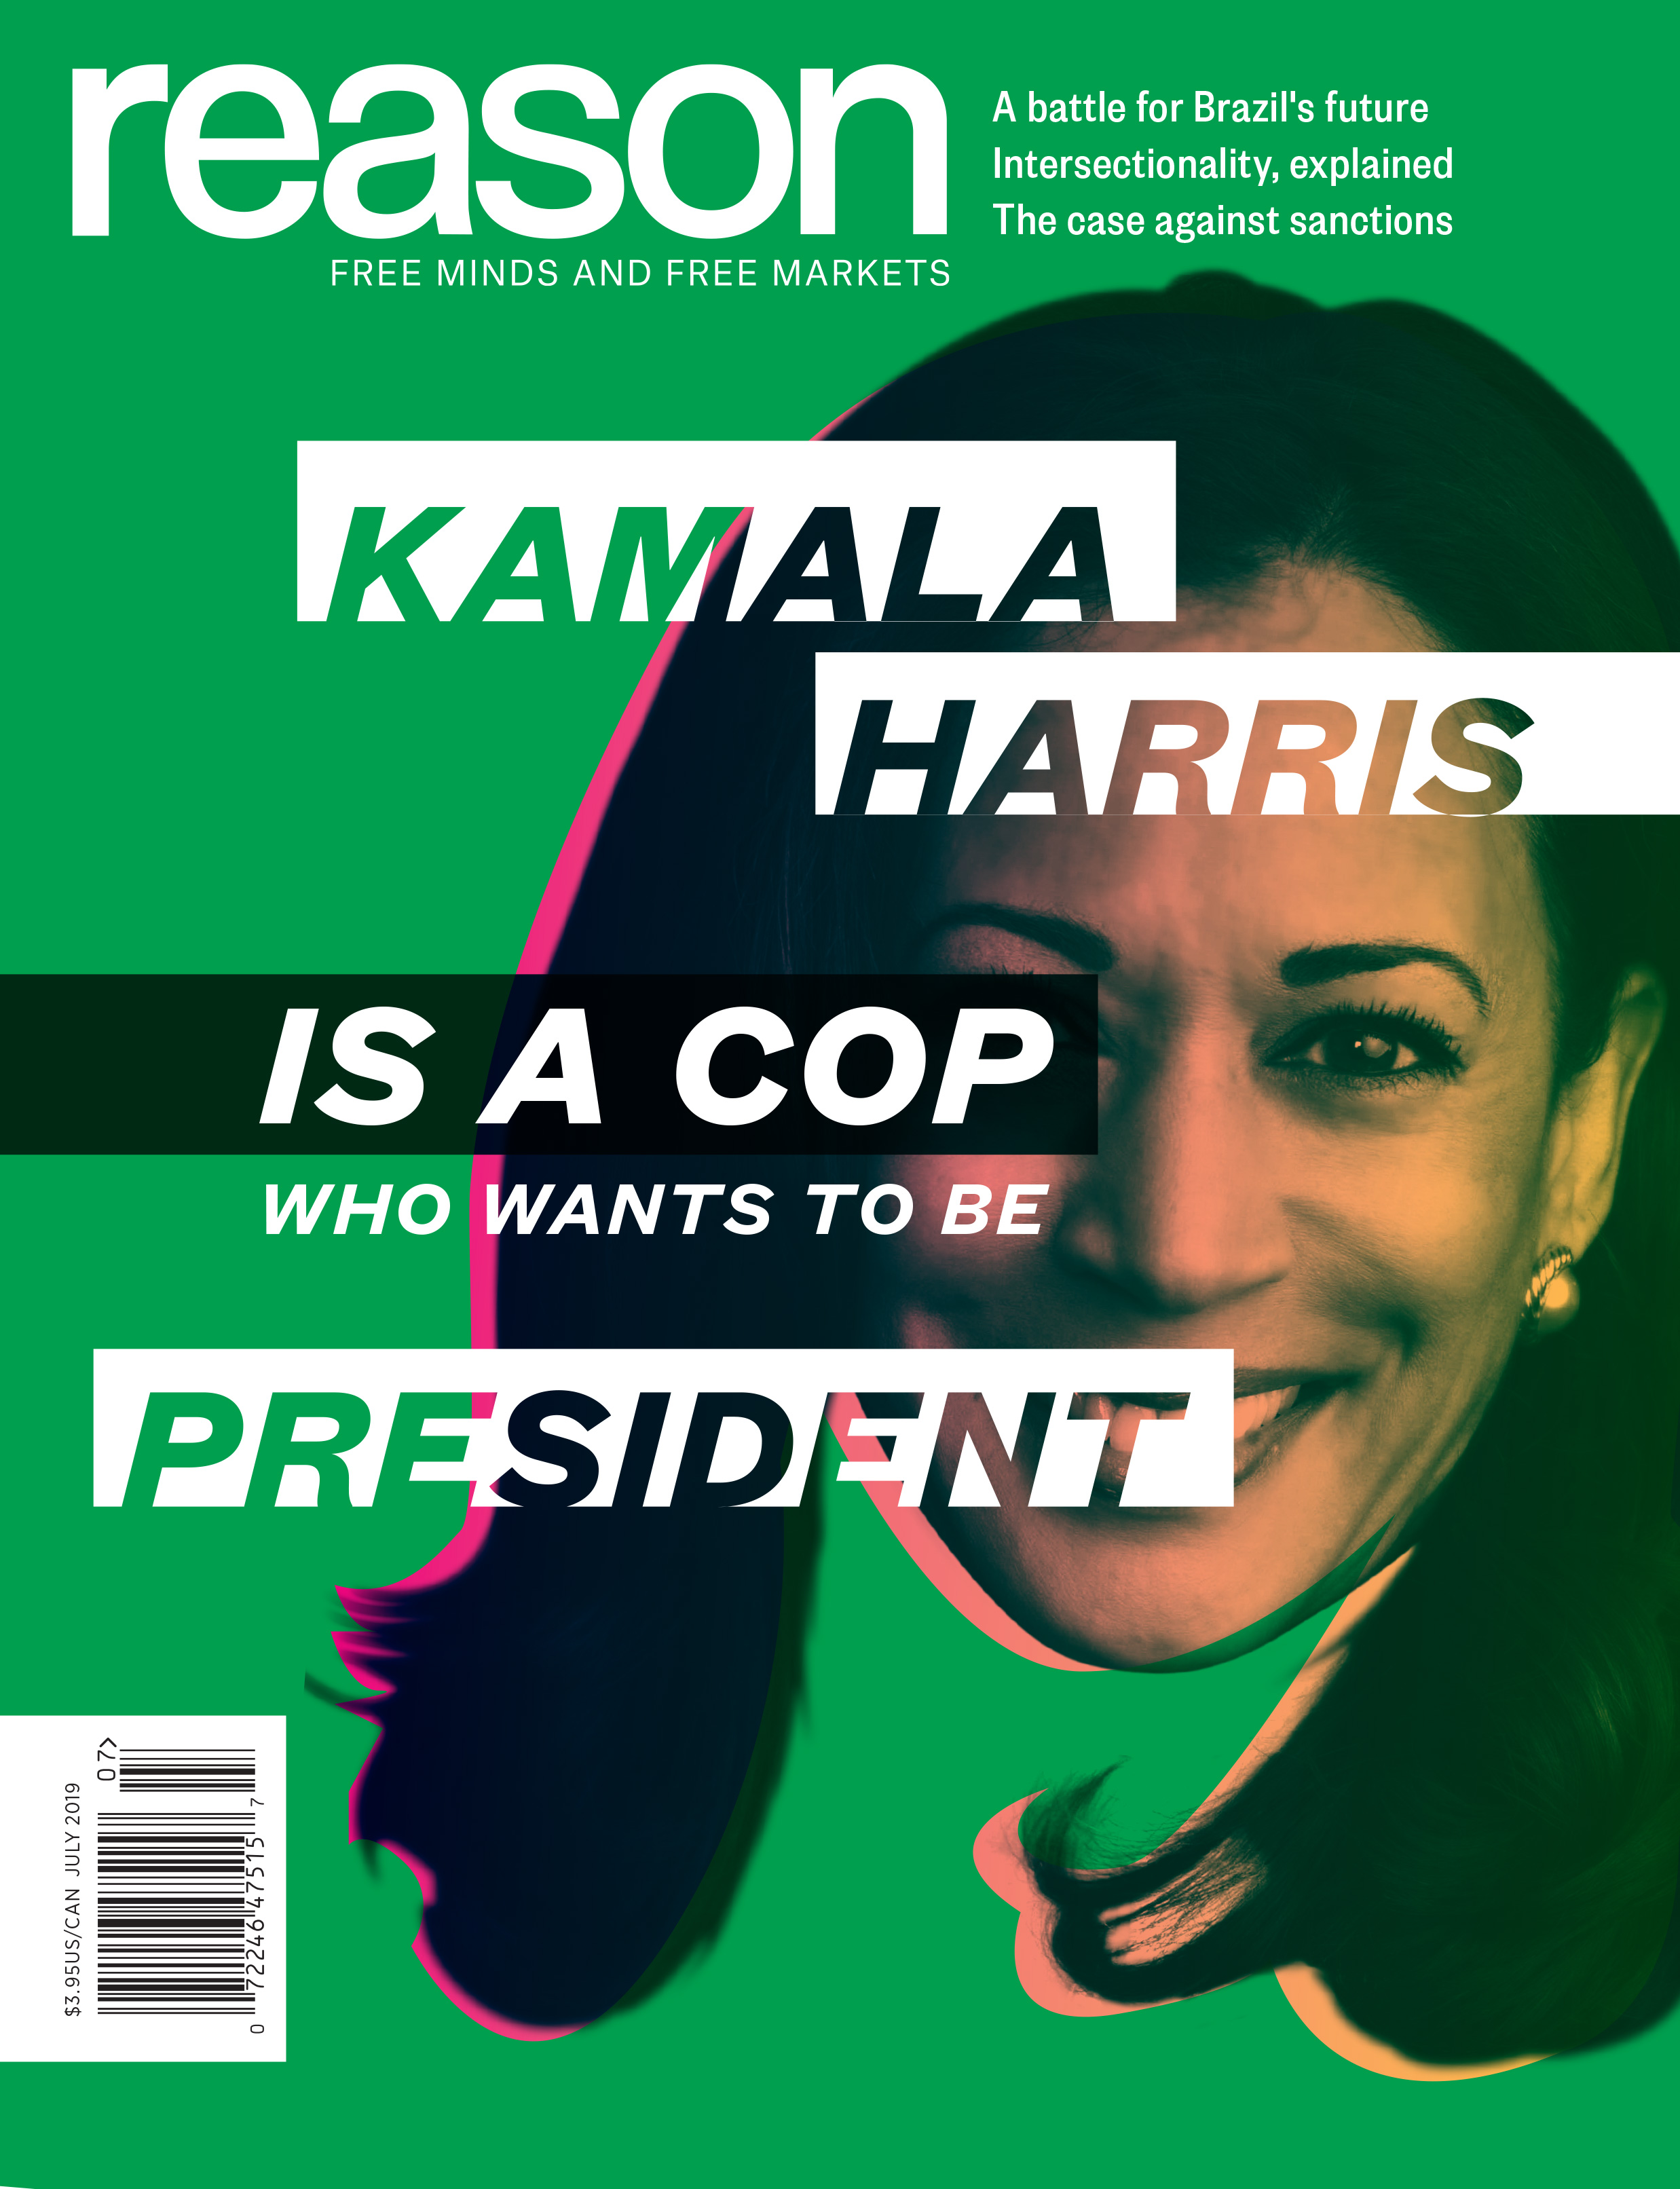 Reason Magazine, July 2019 cover image